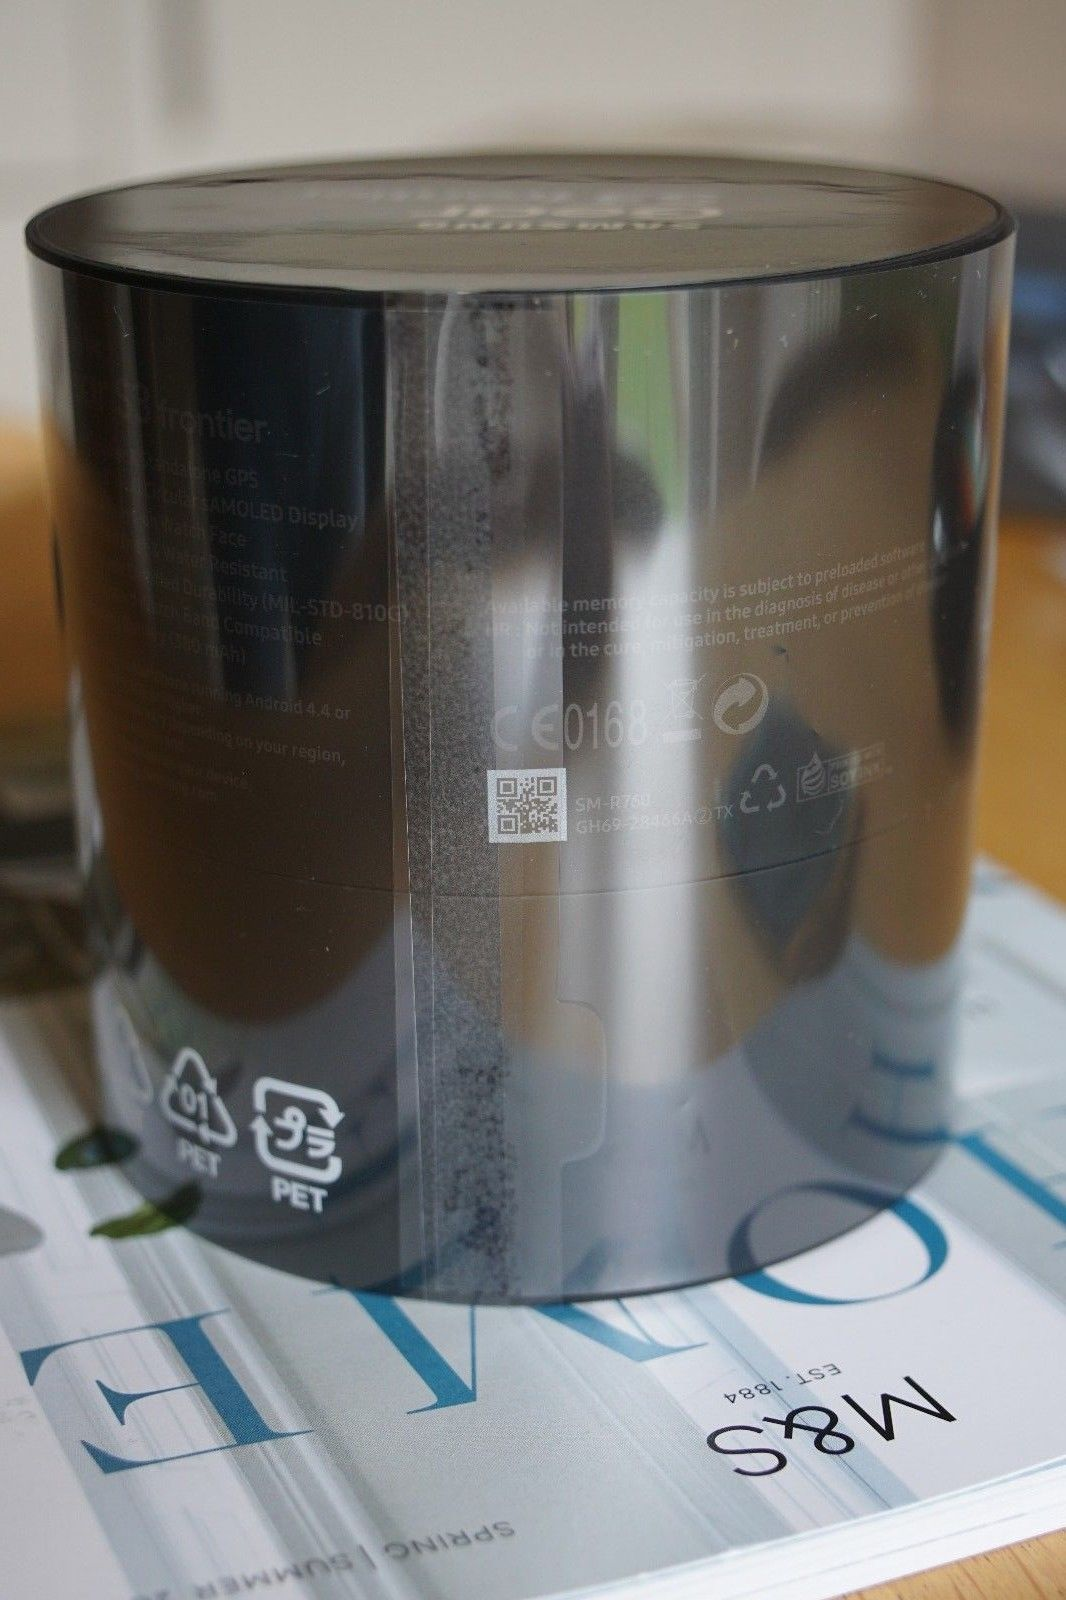 Samsung Gear S3 Frontier Bluetooth Smart Watch